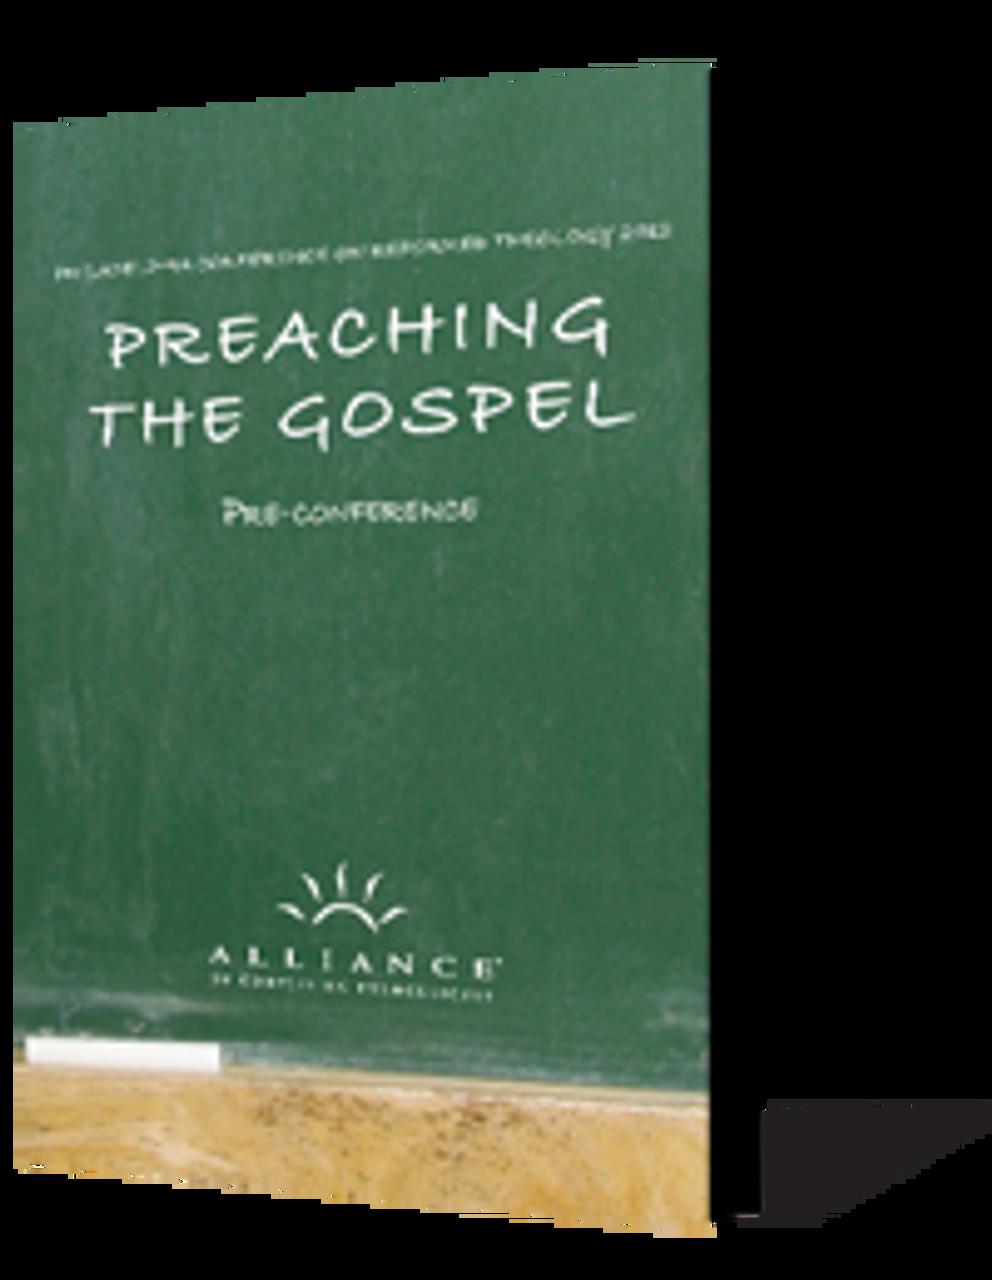 Preaching the Gospel PCRT 2012 Pre-Conference (CD Set)